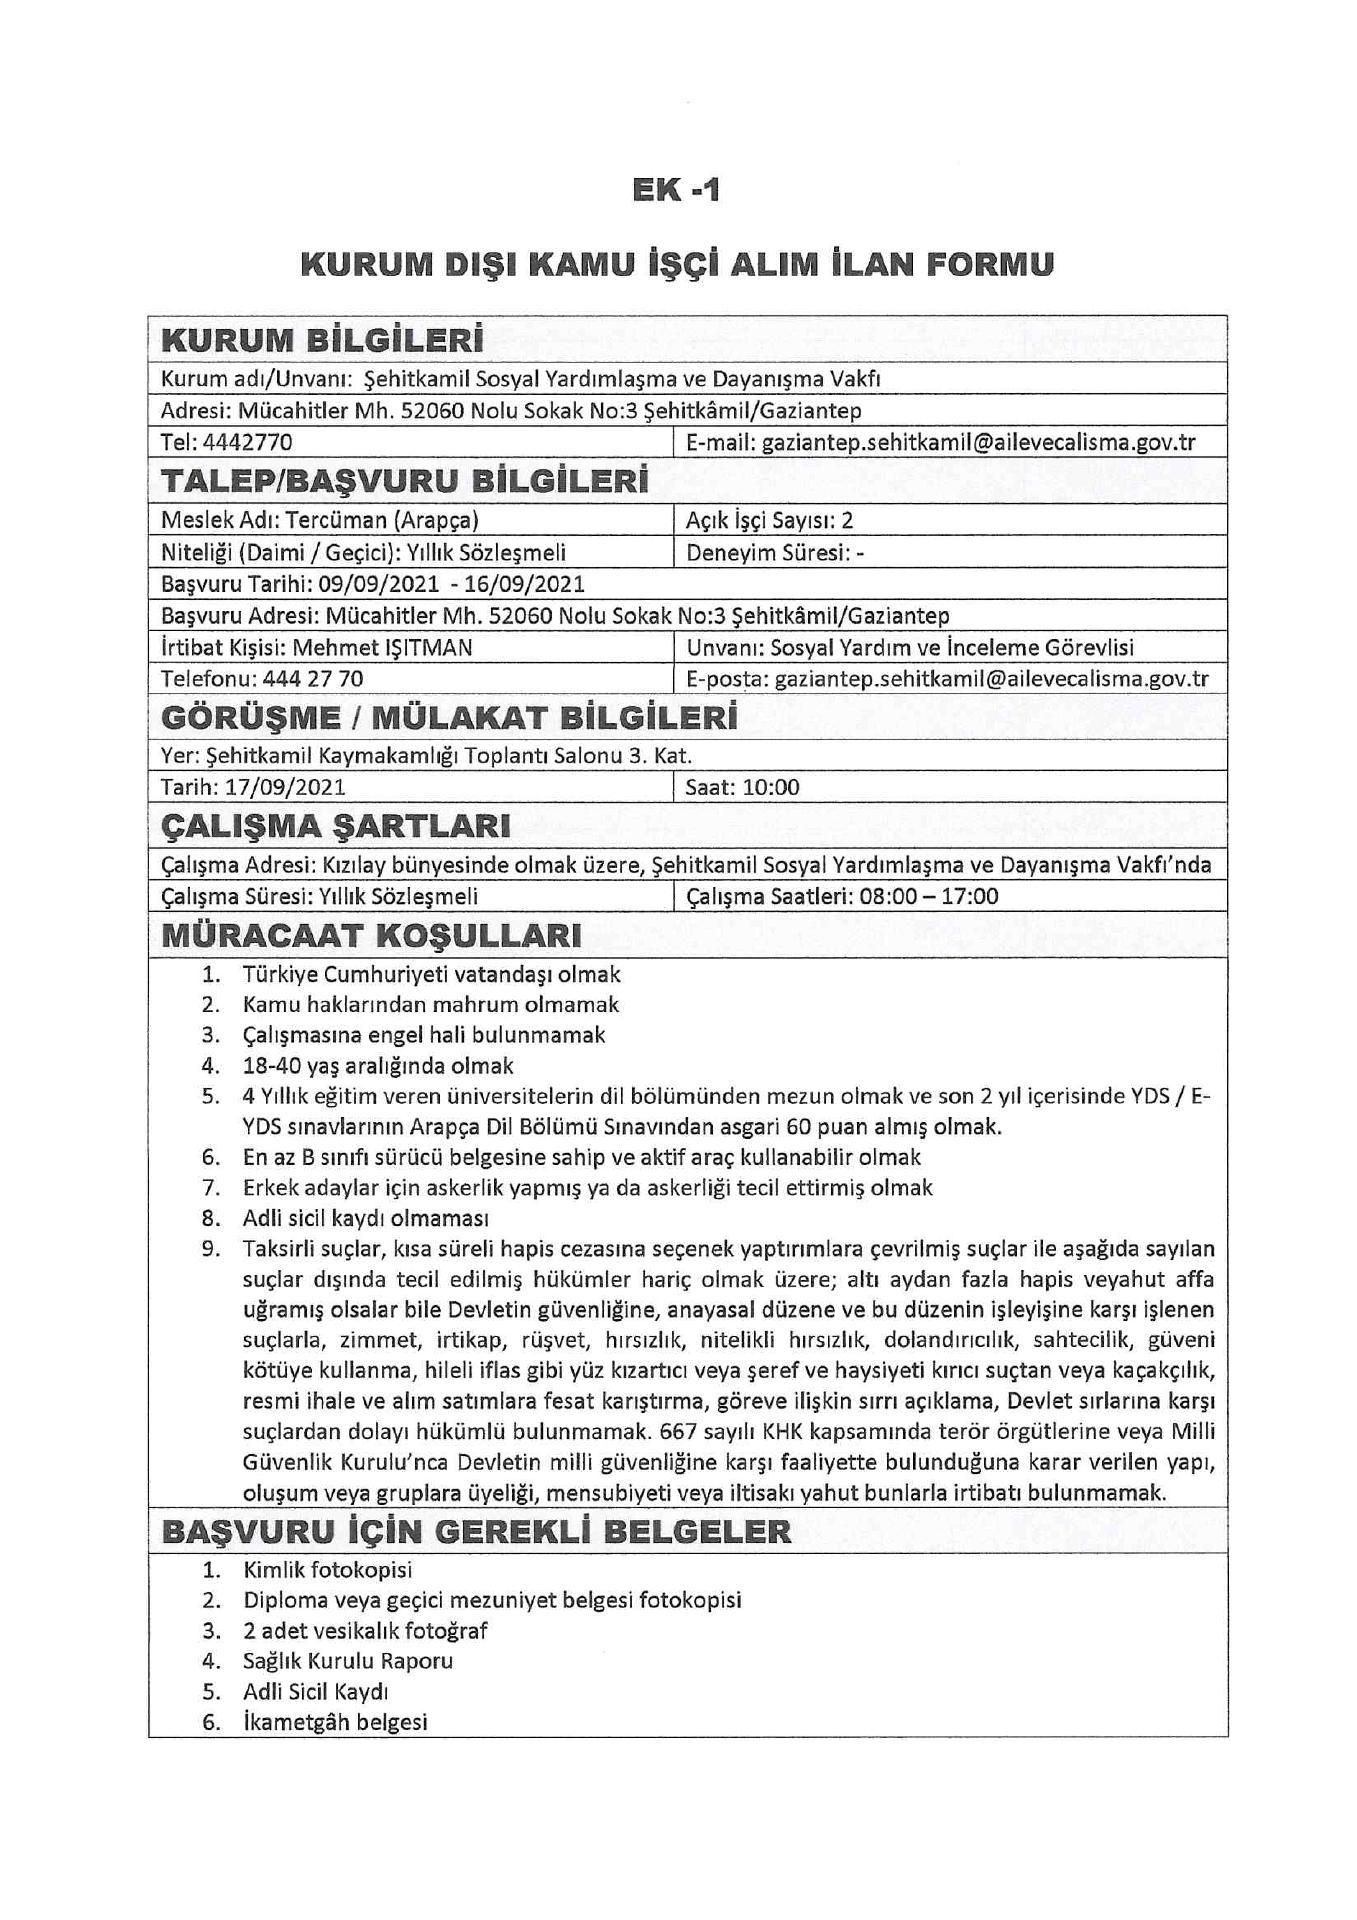 gaziantep-sehitkamil-sydv-16-09-2021-000001.jpg